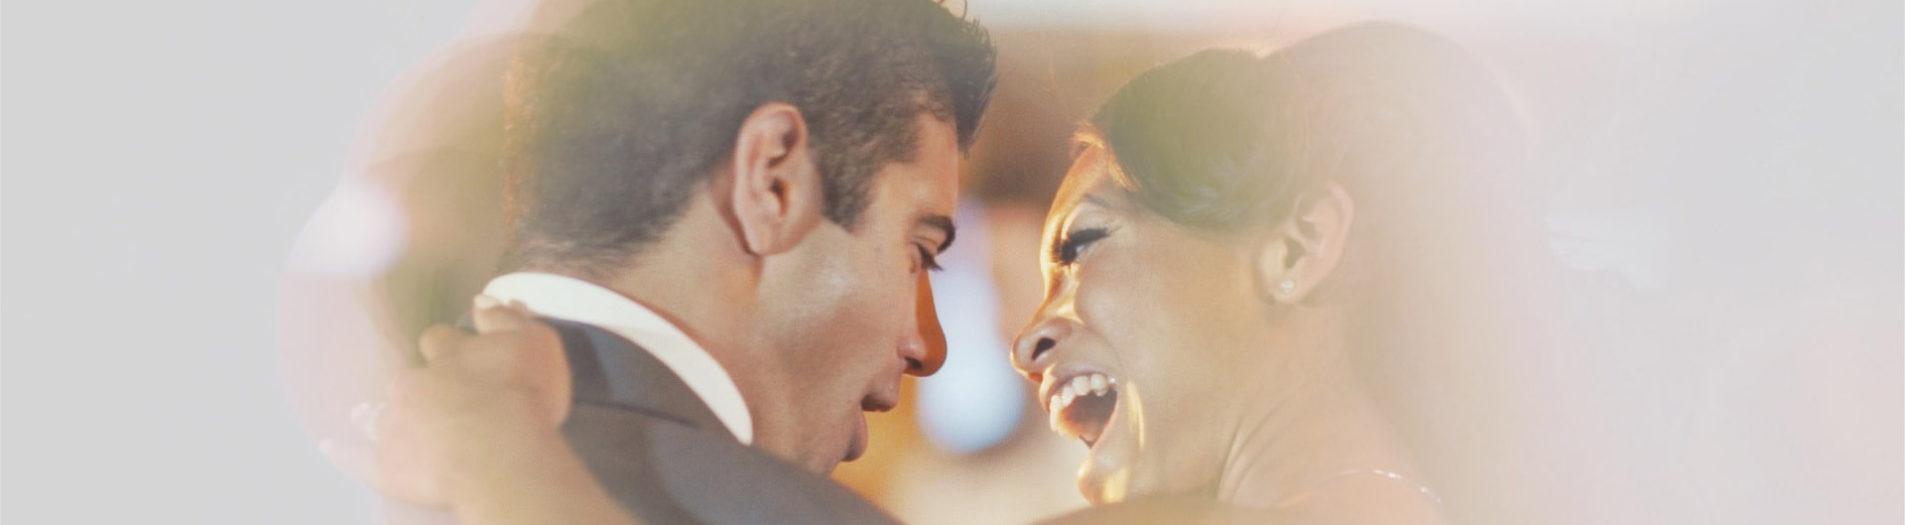 Jenee + Alex | Wedding Highlight Film | Royal Vancouver Yacht Club, Vancouver BC